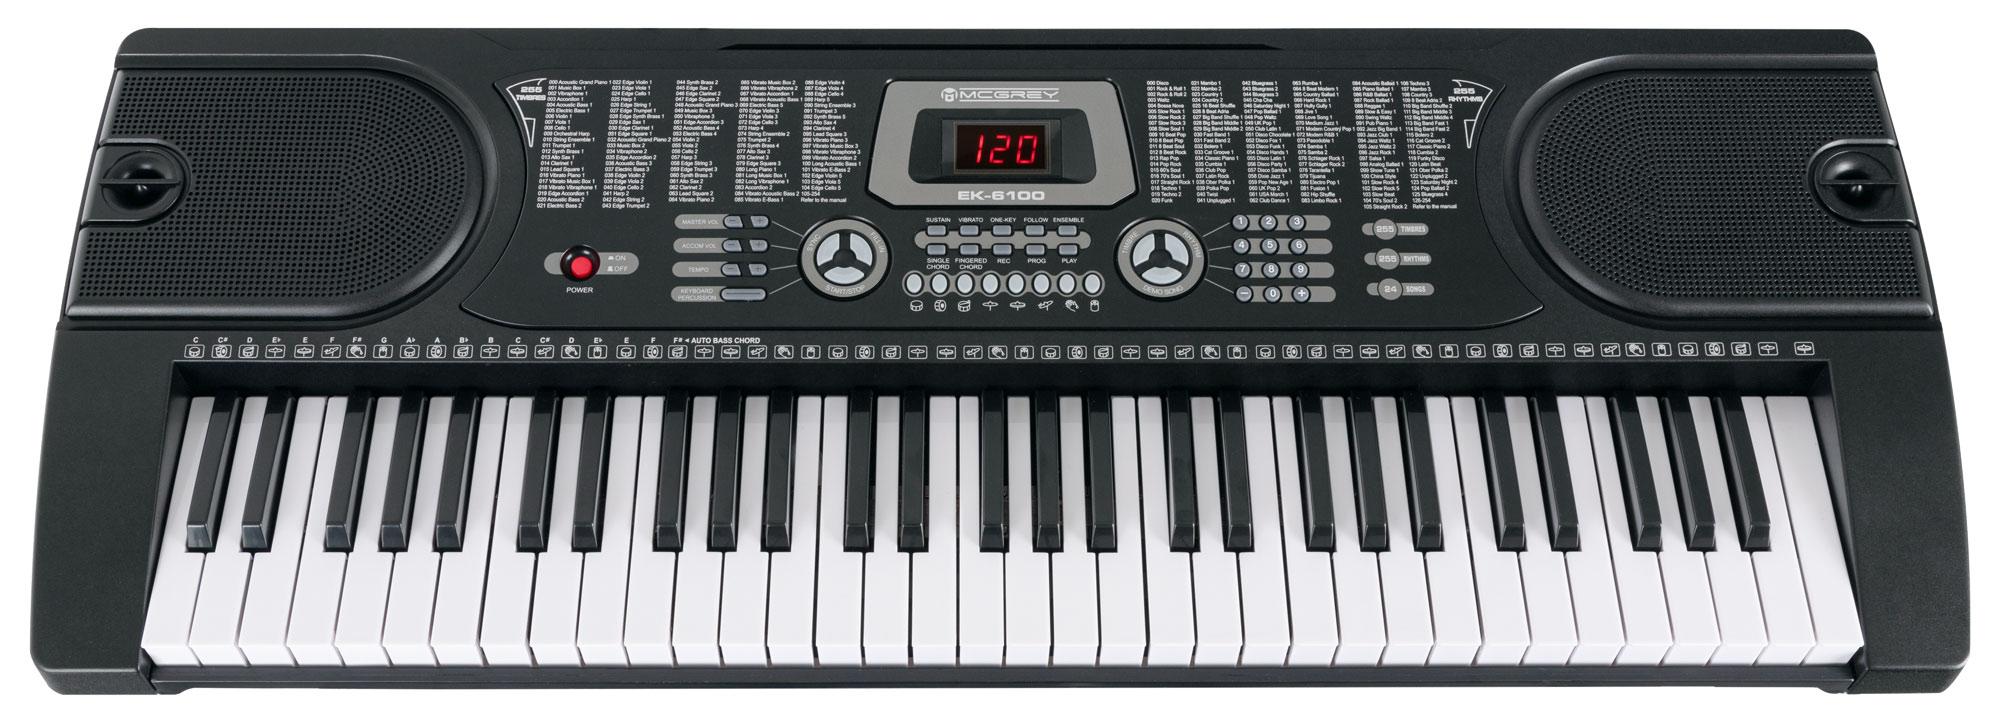 McGrey EK 6100 Keyboard